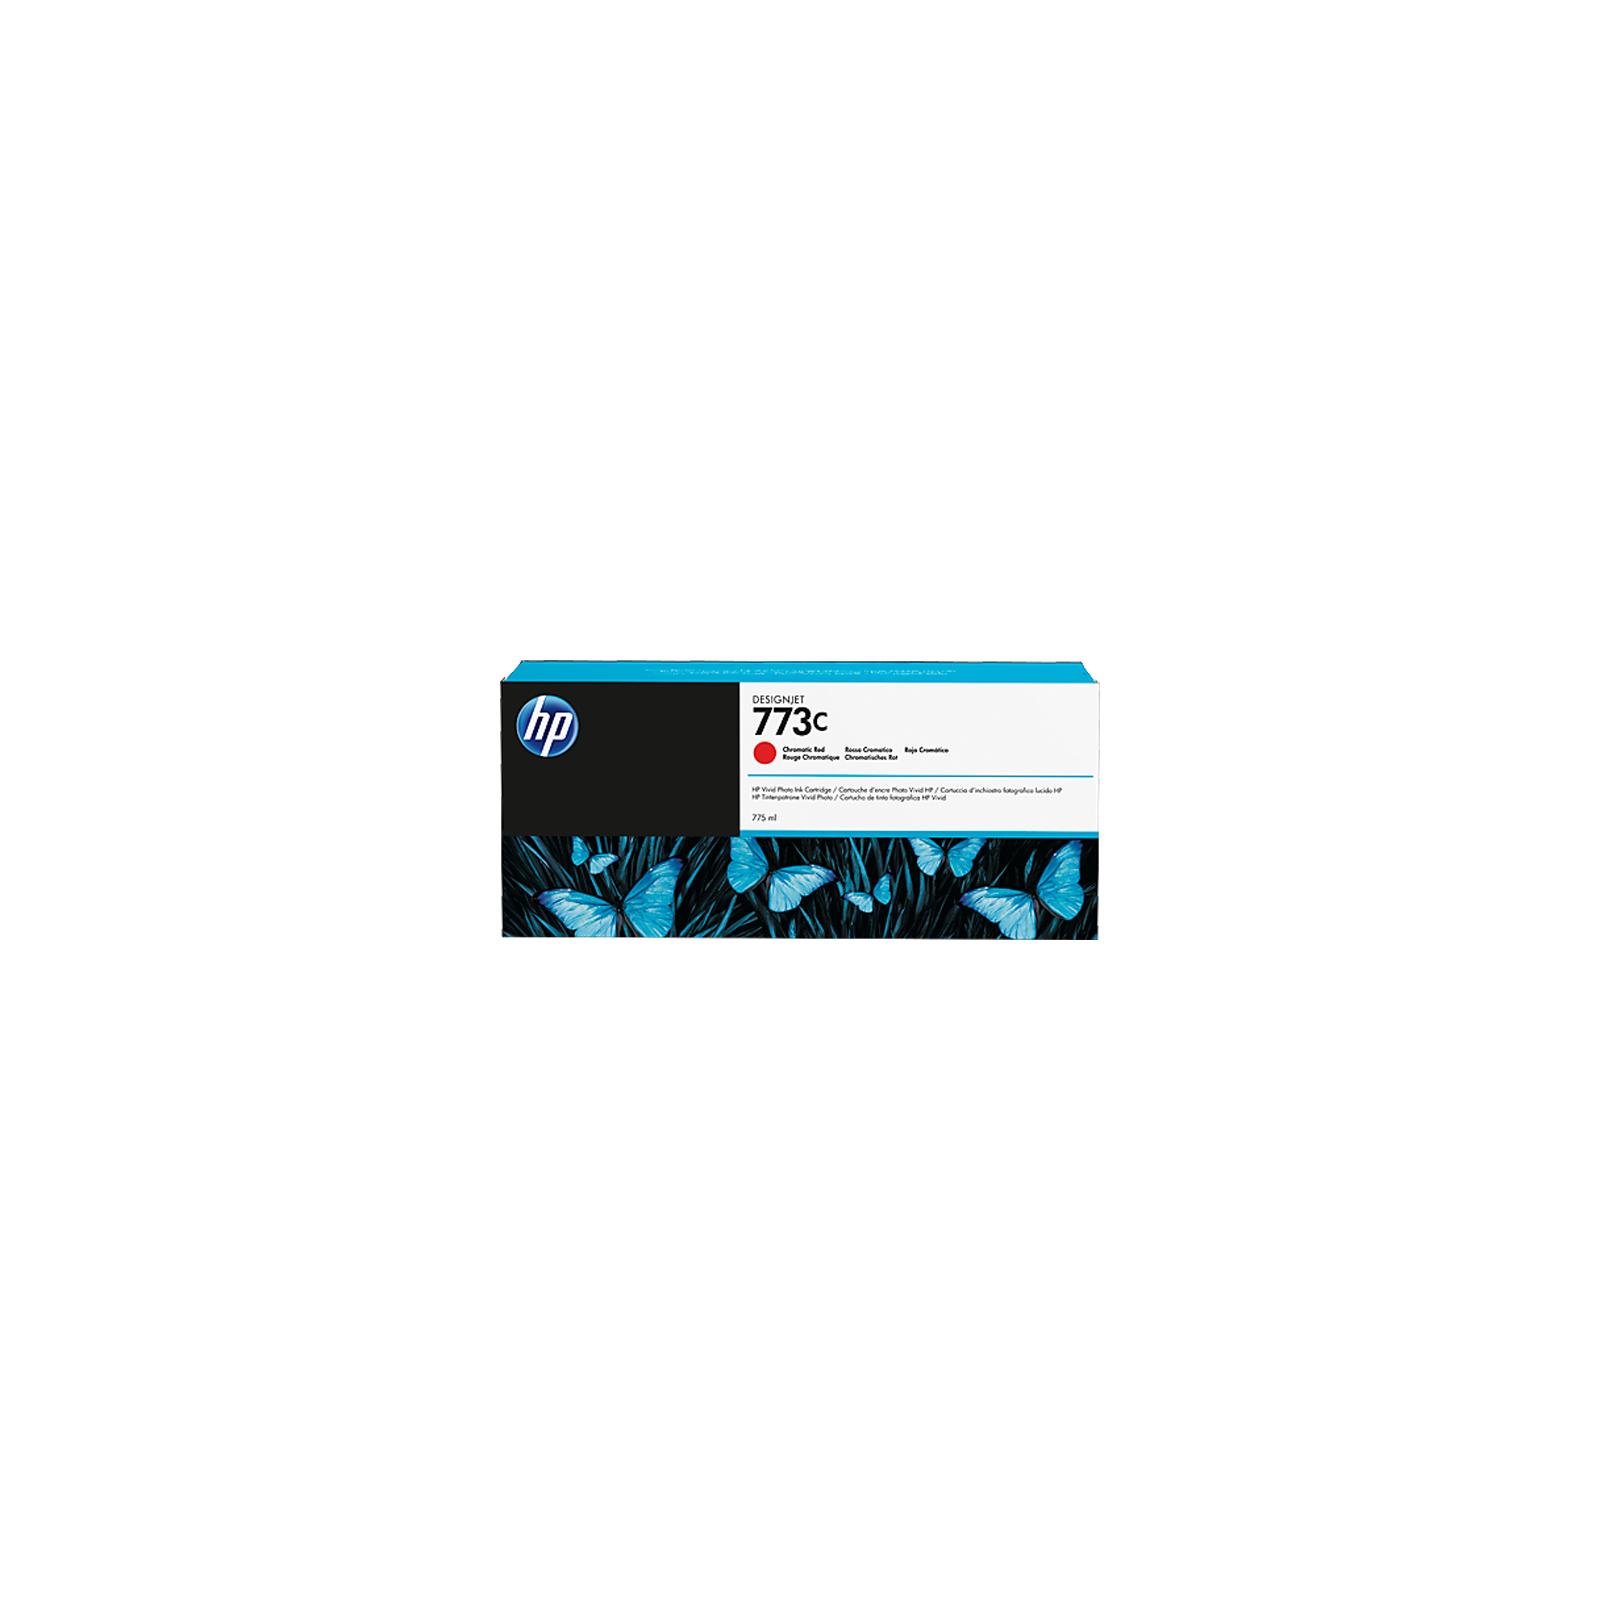 Картридж HP DJ No.773C Chromatic Red DesignJet Ink Cartridge (C1Q38A)